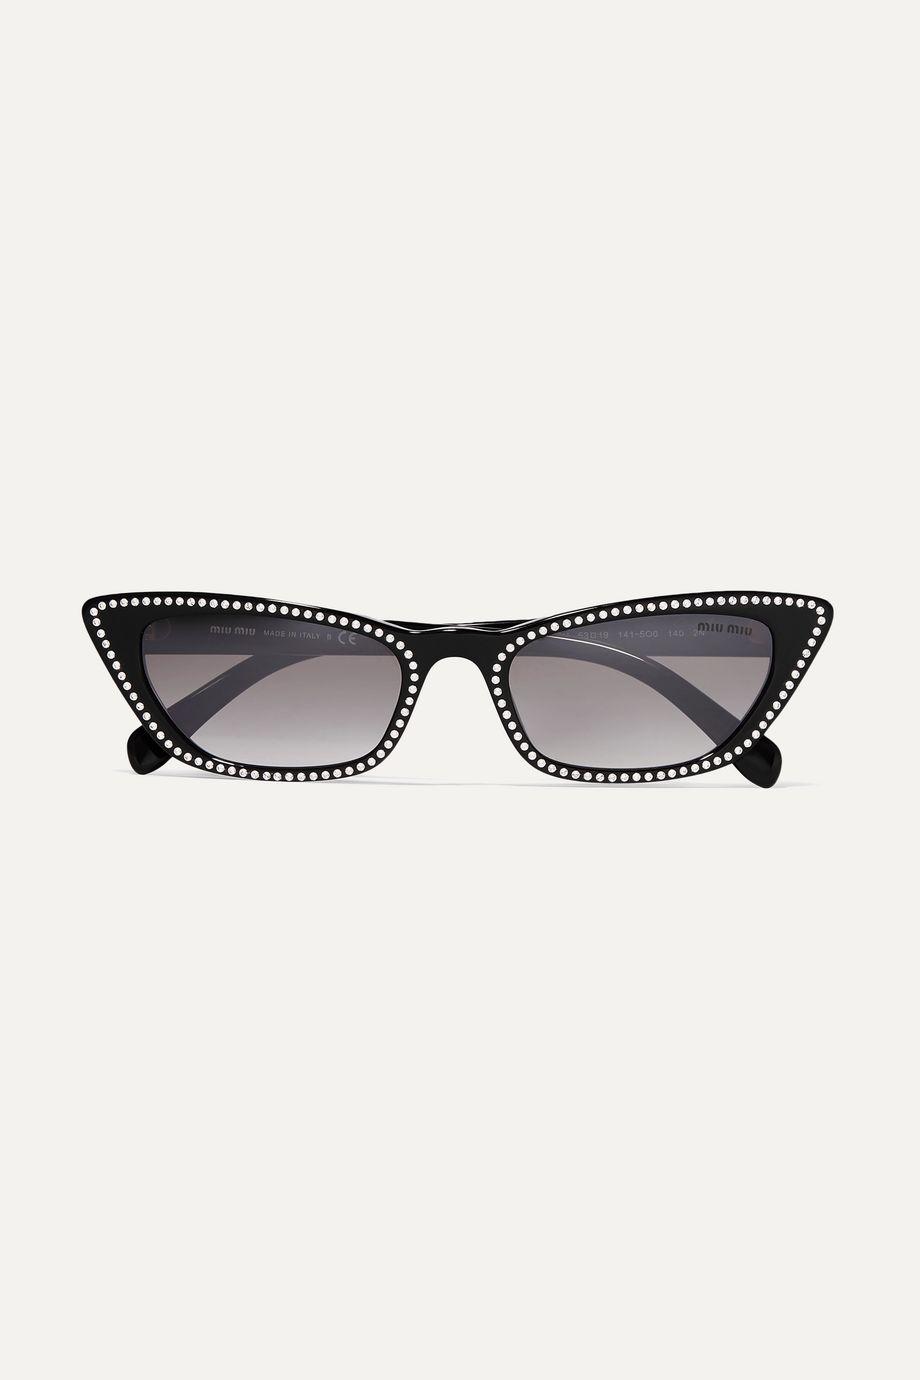 Miu Miu Cat-eye studded acetate sunglasses